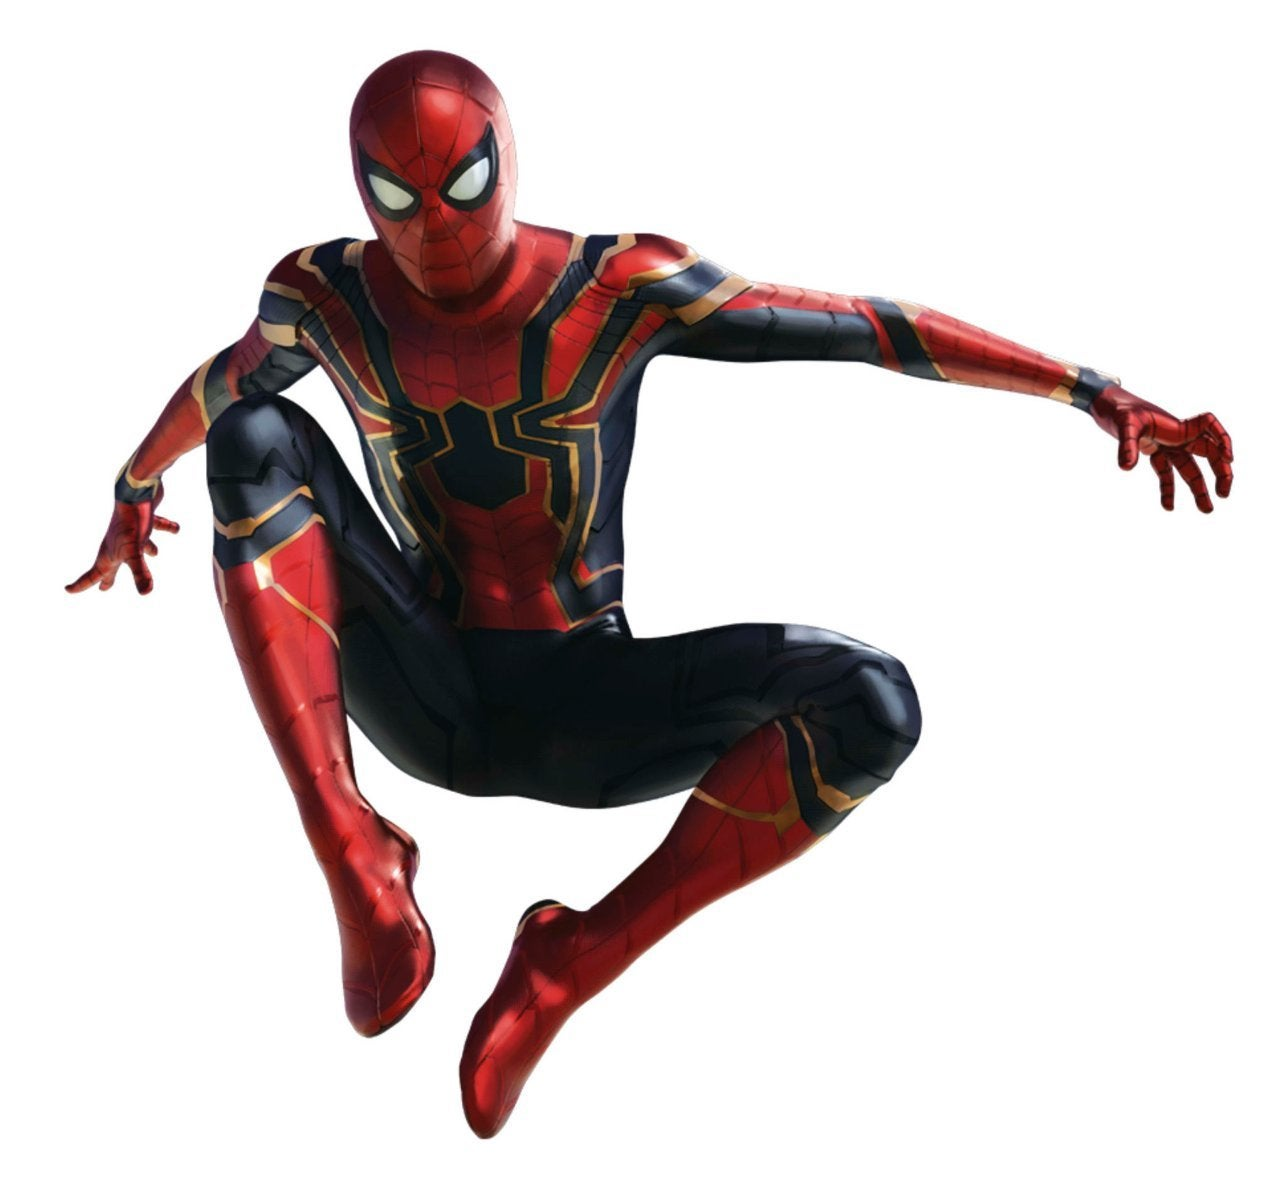 Avengers Infinity War Promo Art - Spider-Man